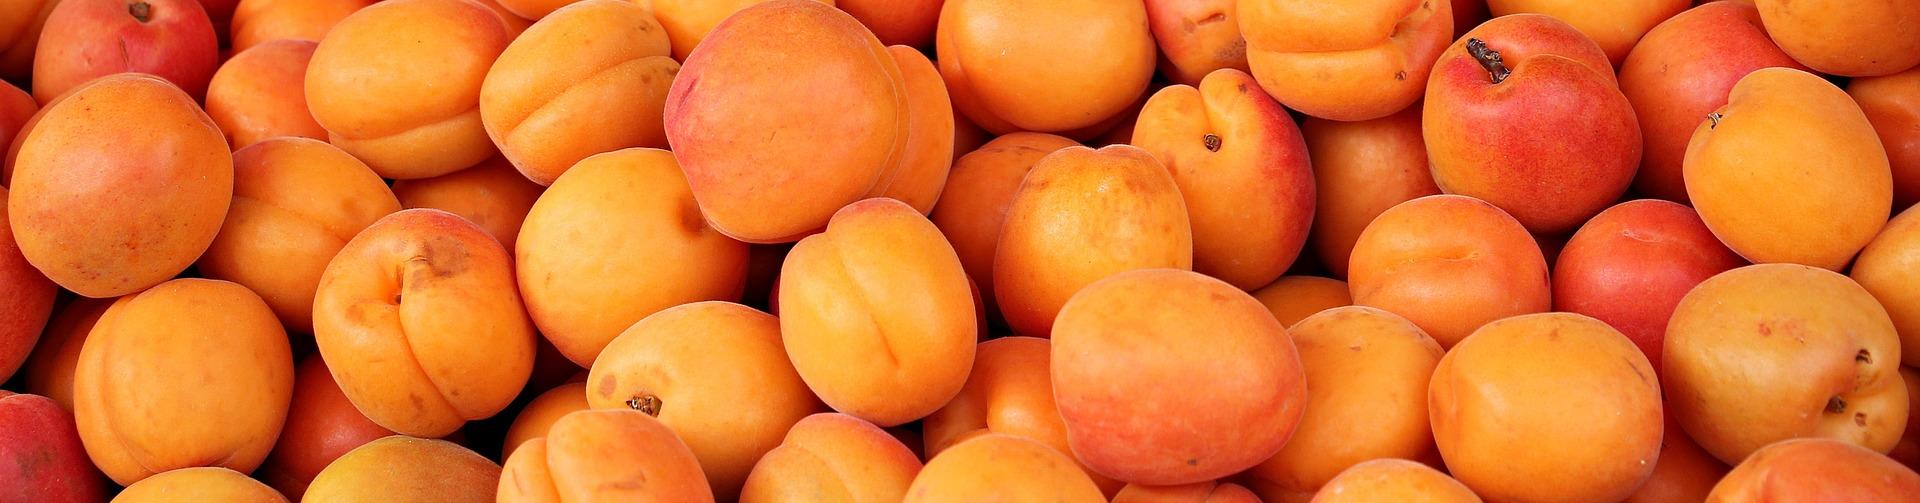 https://cestovnakancelariadaka.sk/files/product/apricots-1422591_1920.jpg